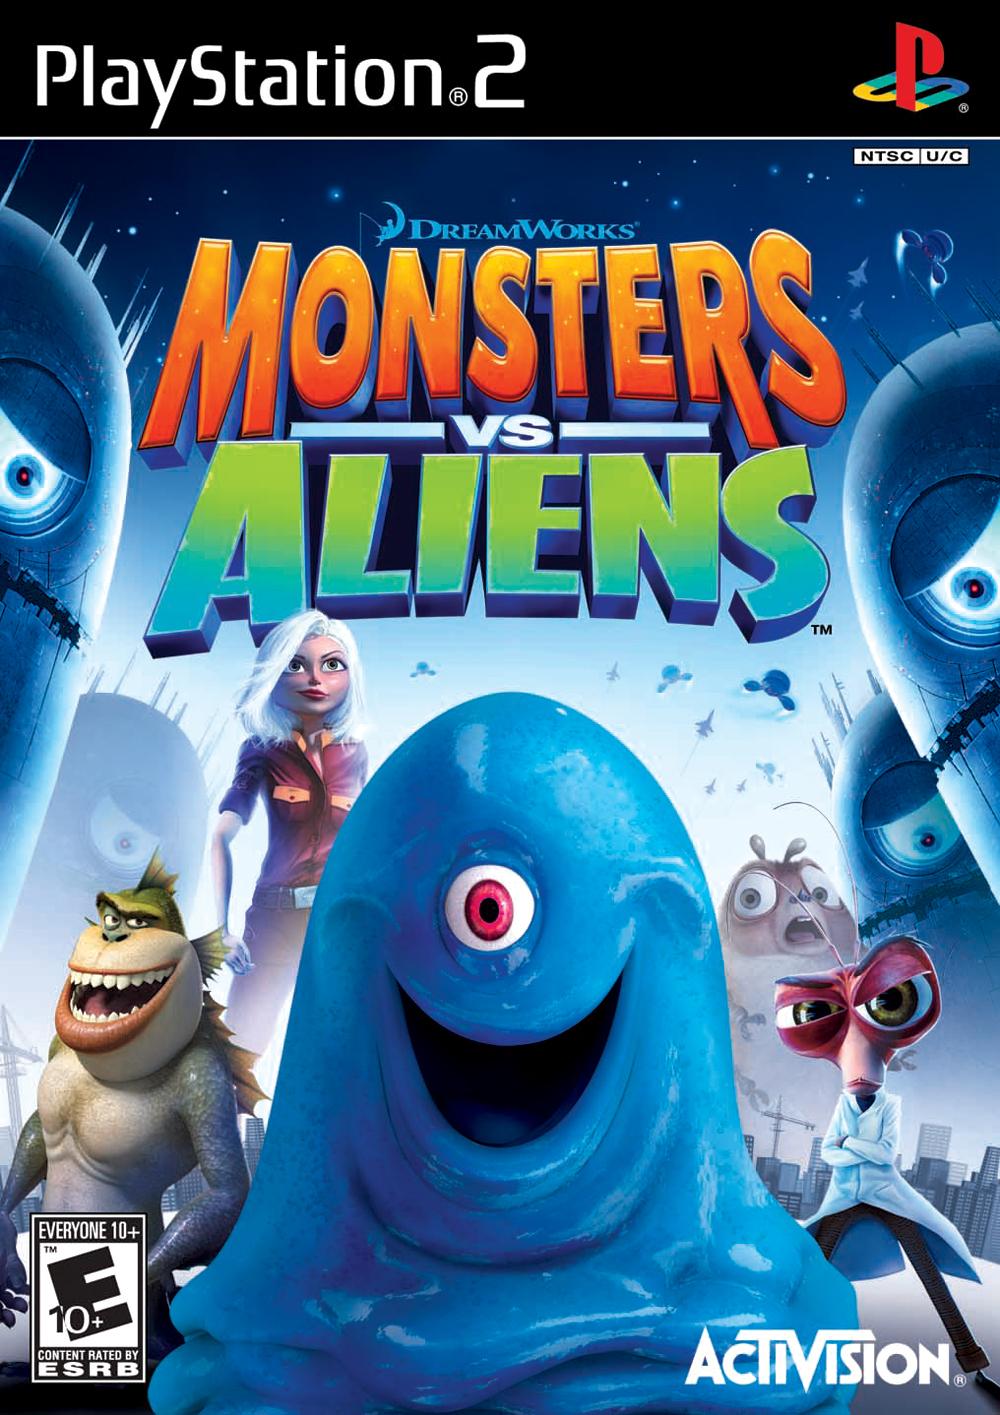 Monsters vs. Aliens (video game)